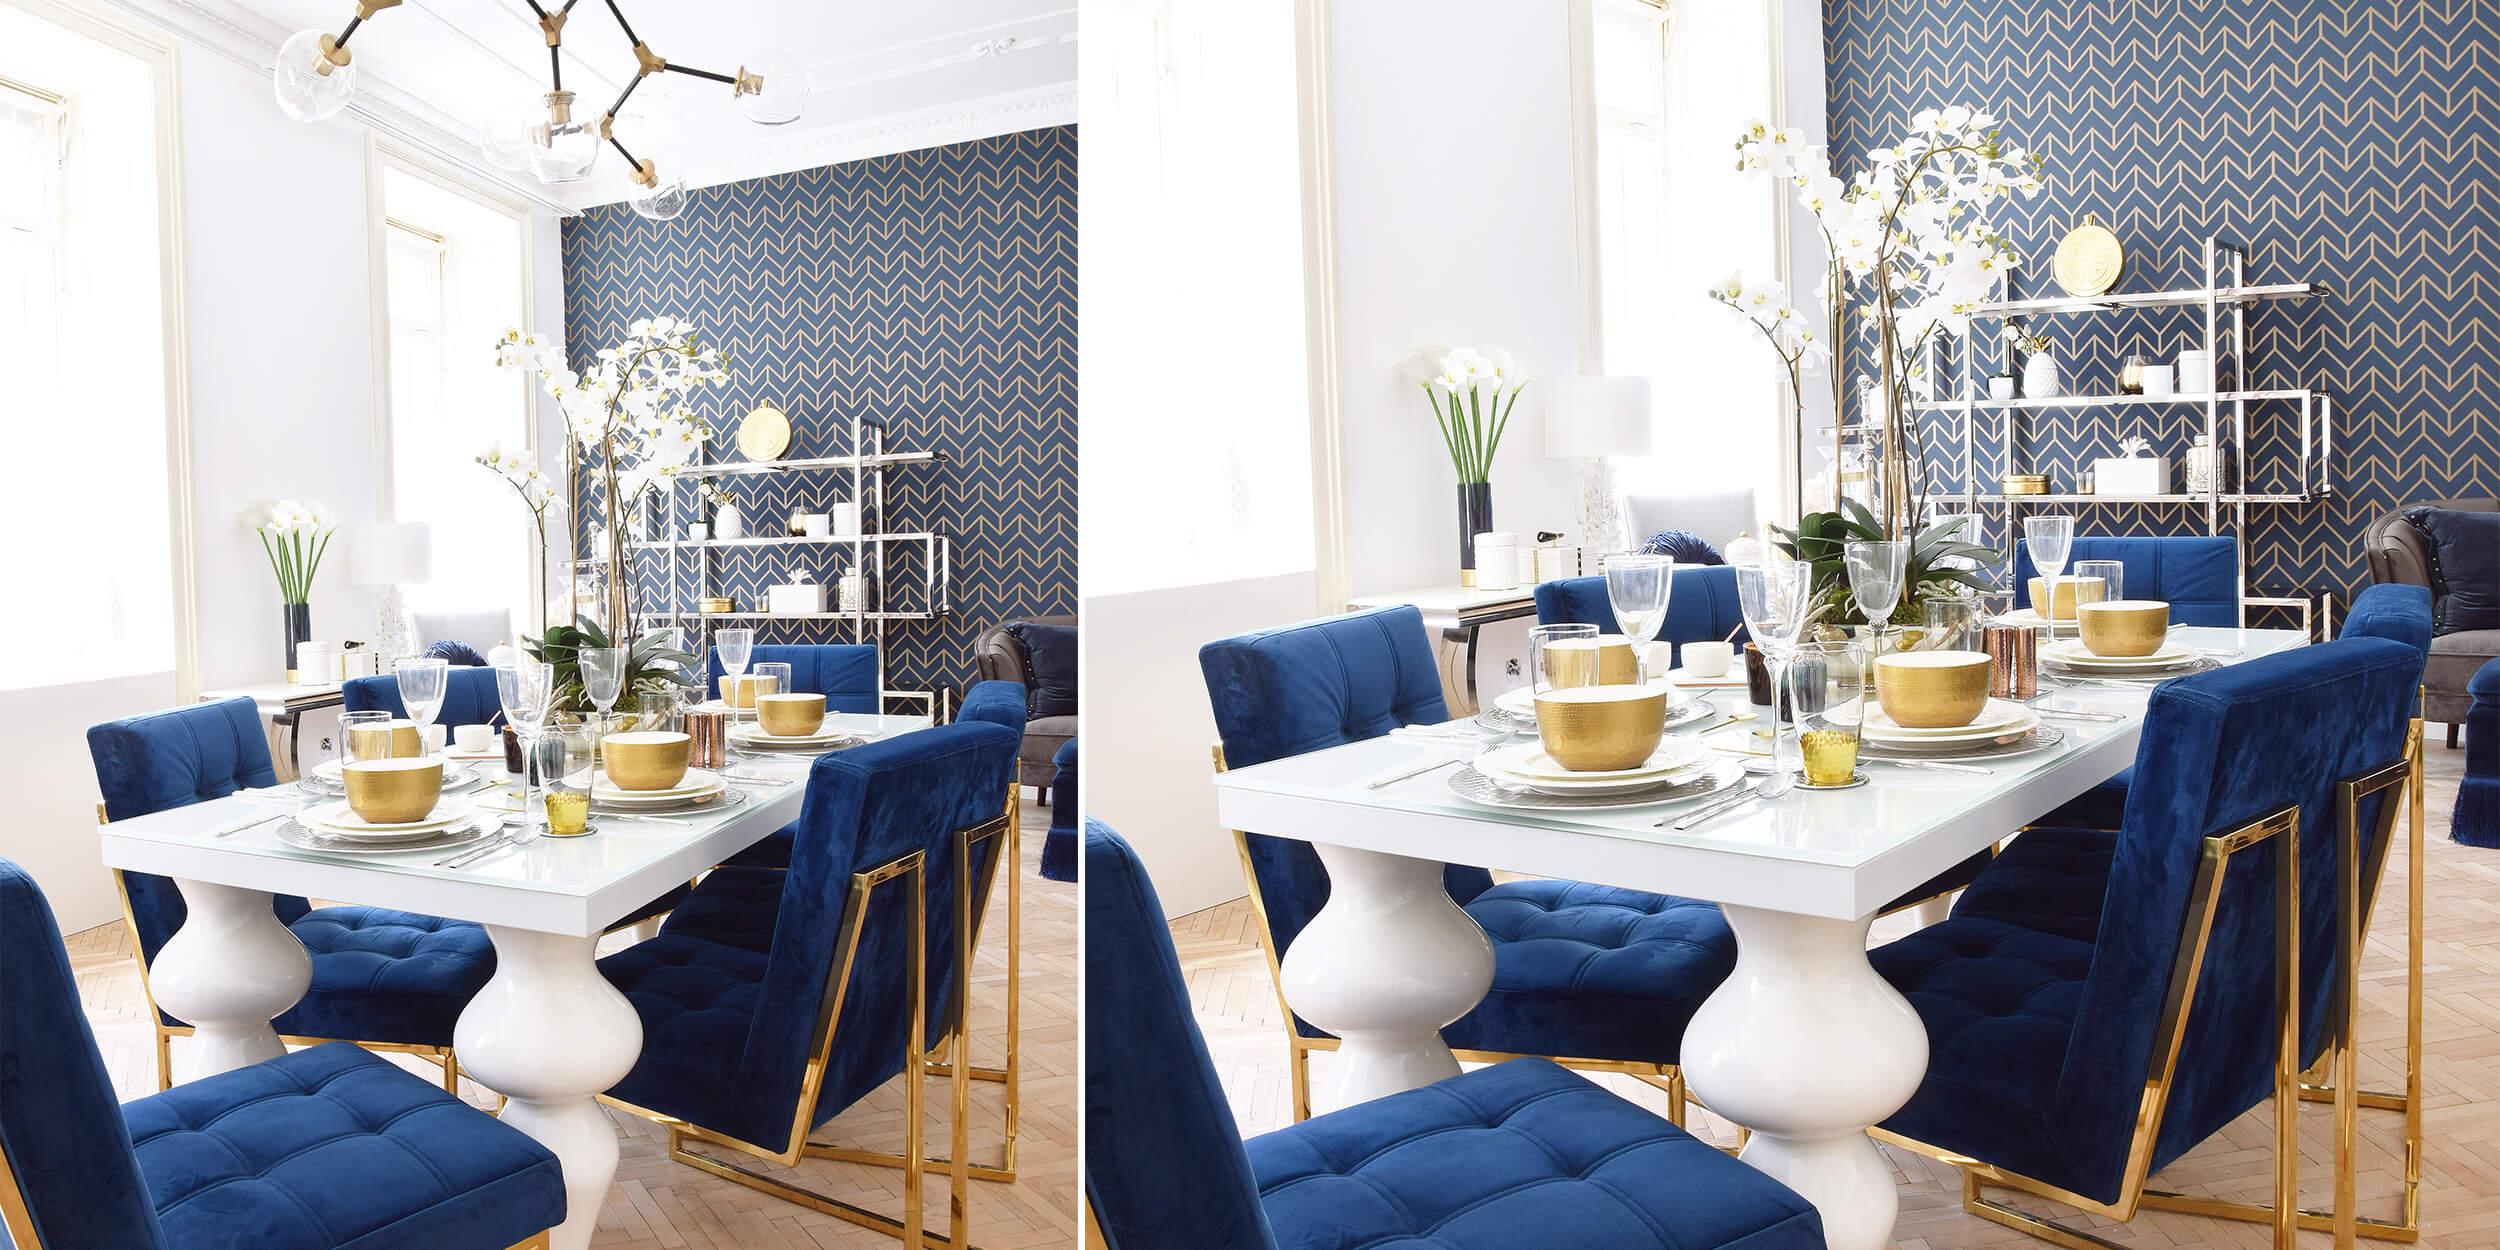 Royal Dinner: Extravagante Tafel & königsblaue Samtsessel